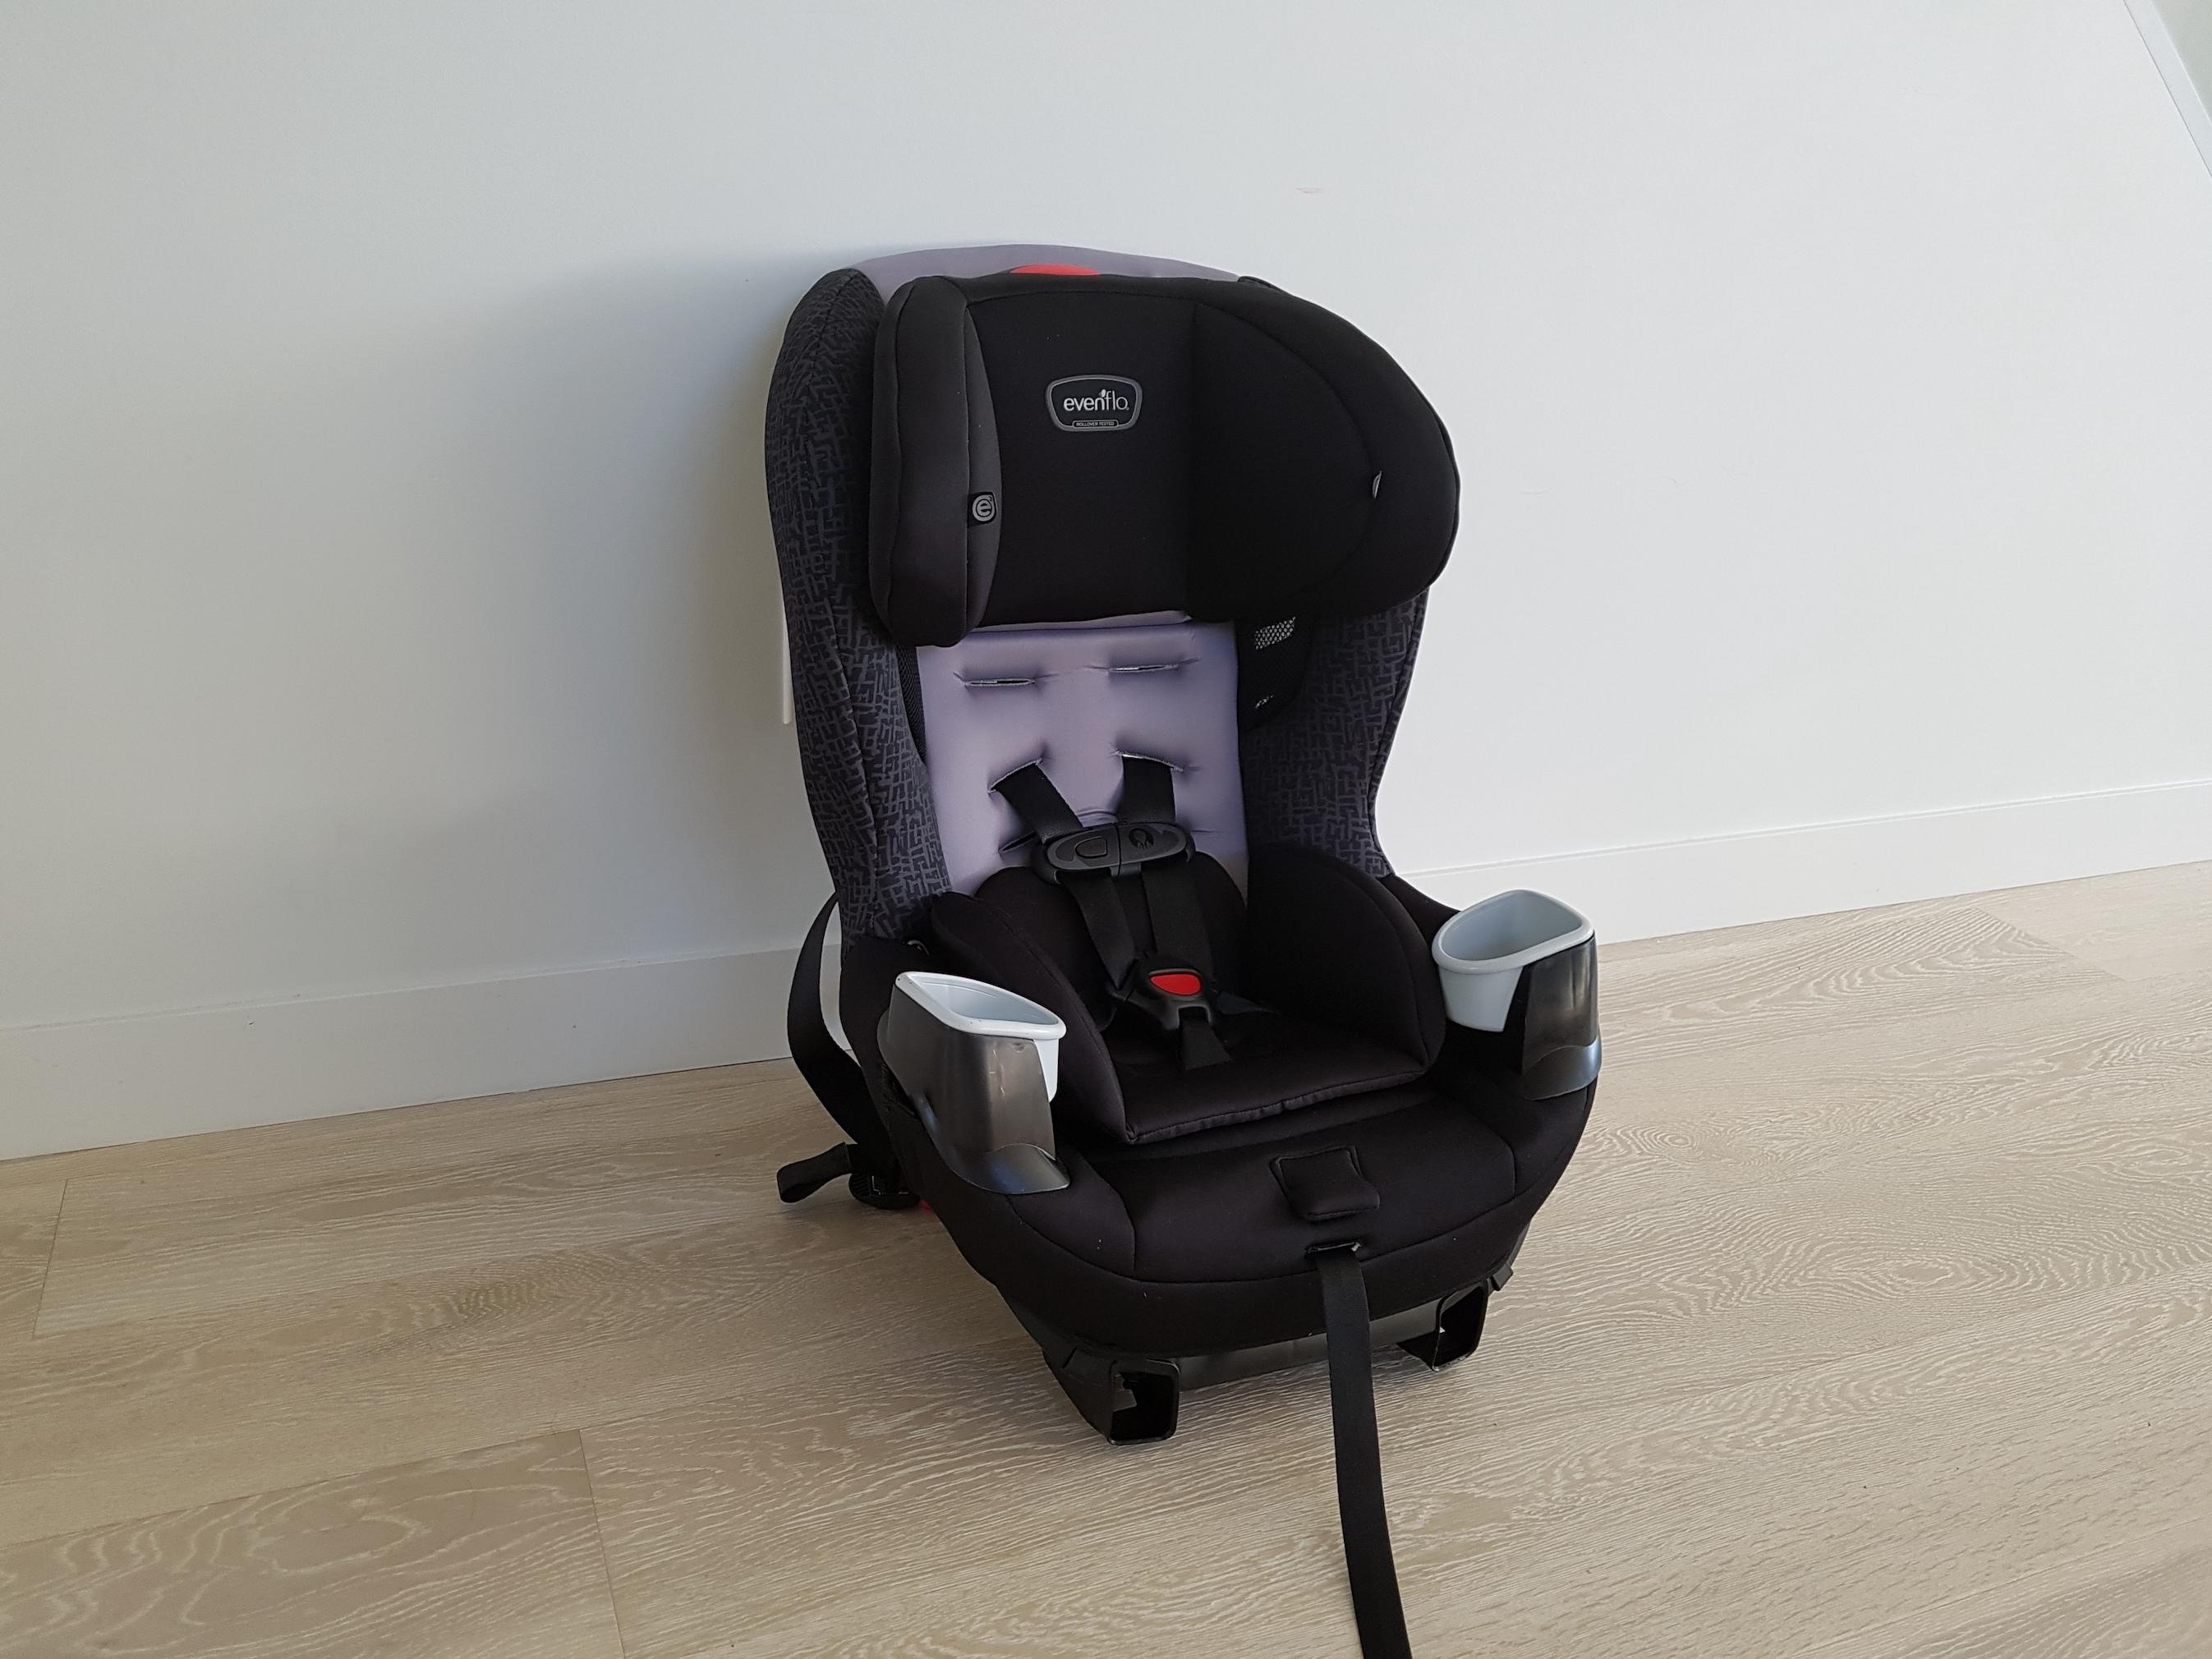 evenflo_car_seat_bby_profile